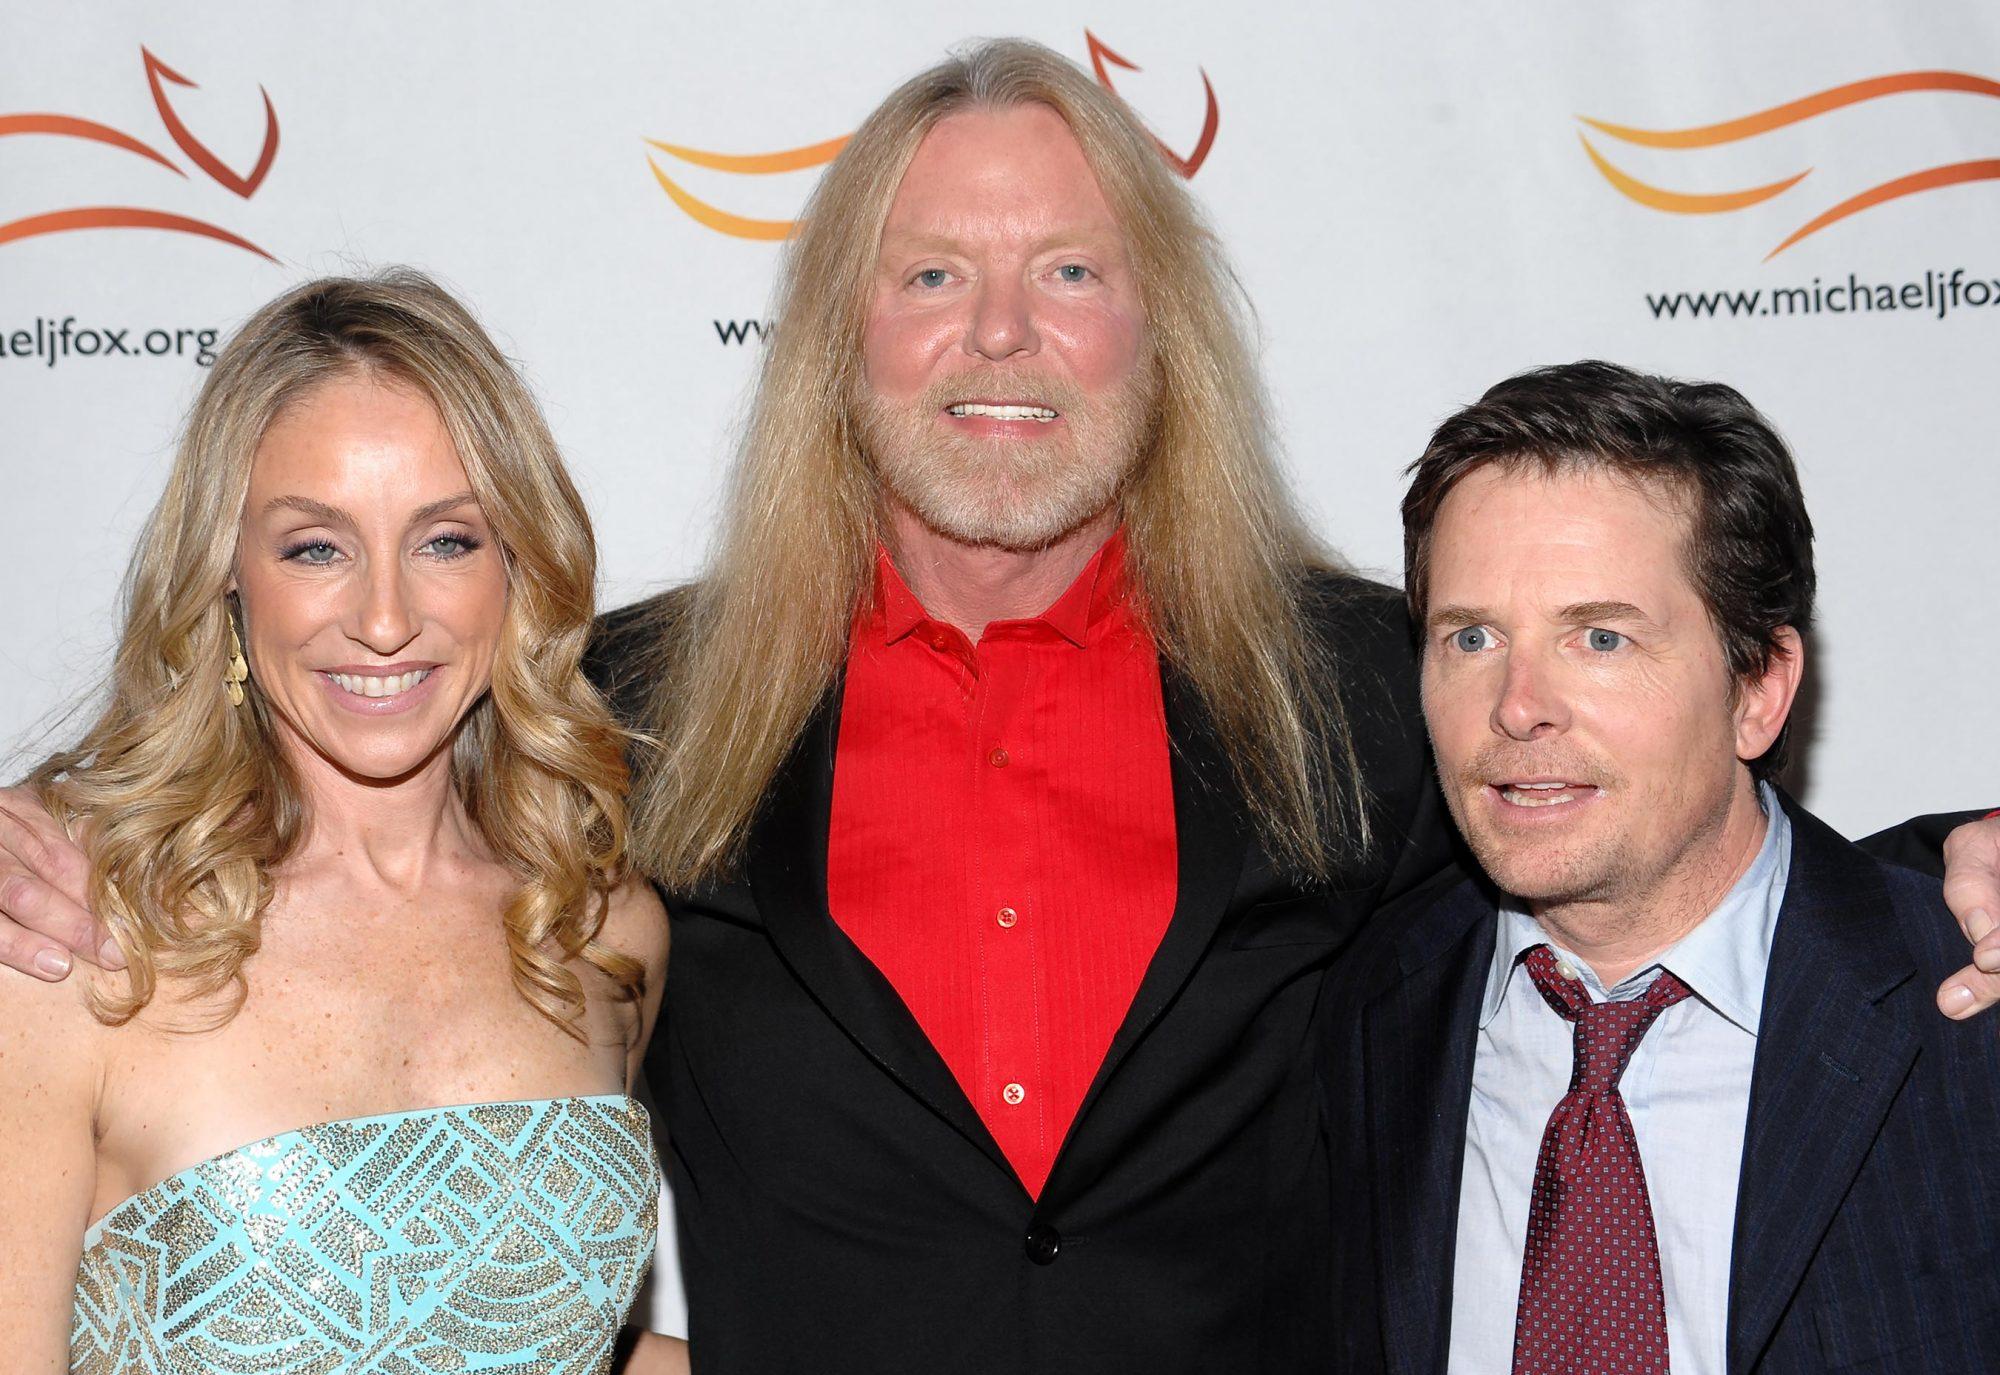 Tracy Pollan, Gregg Allman, Michael J Fox